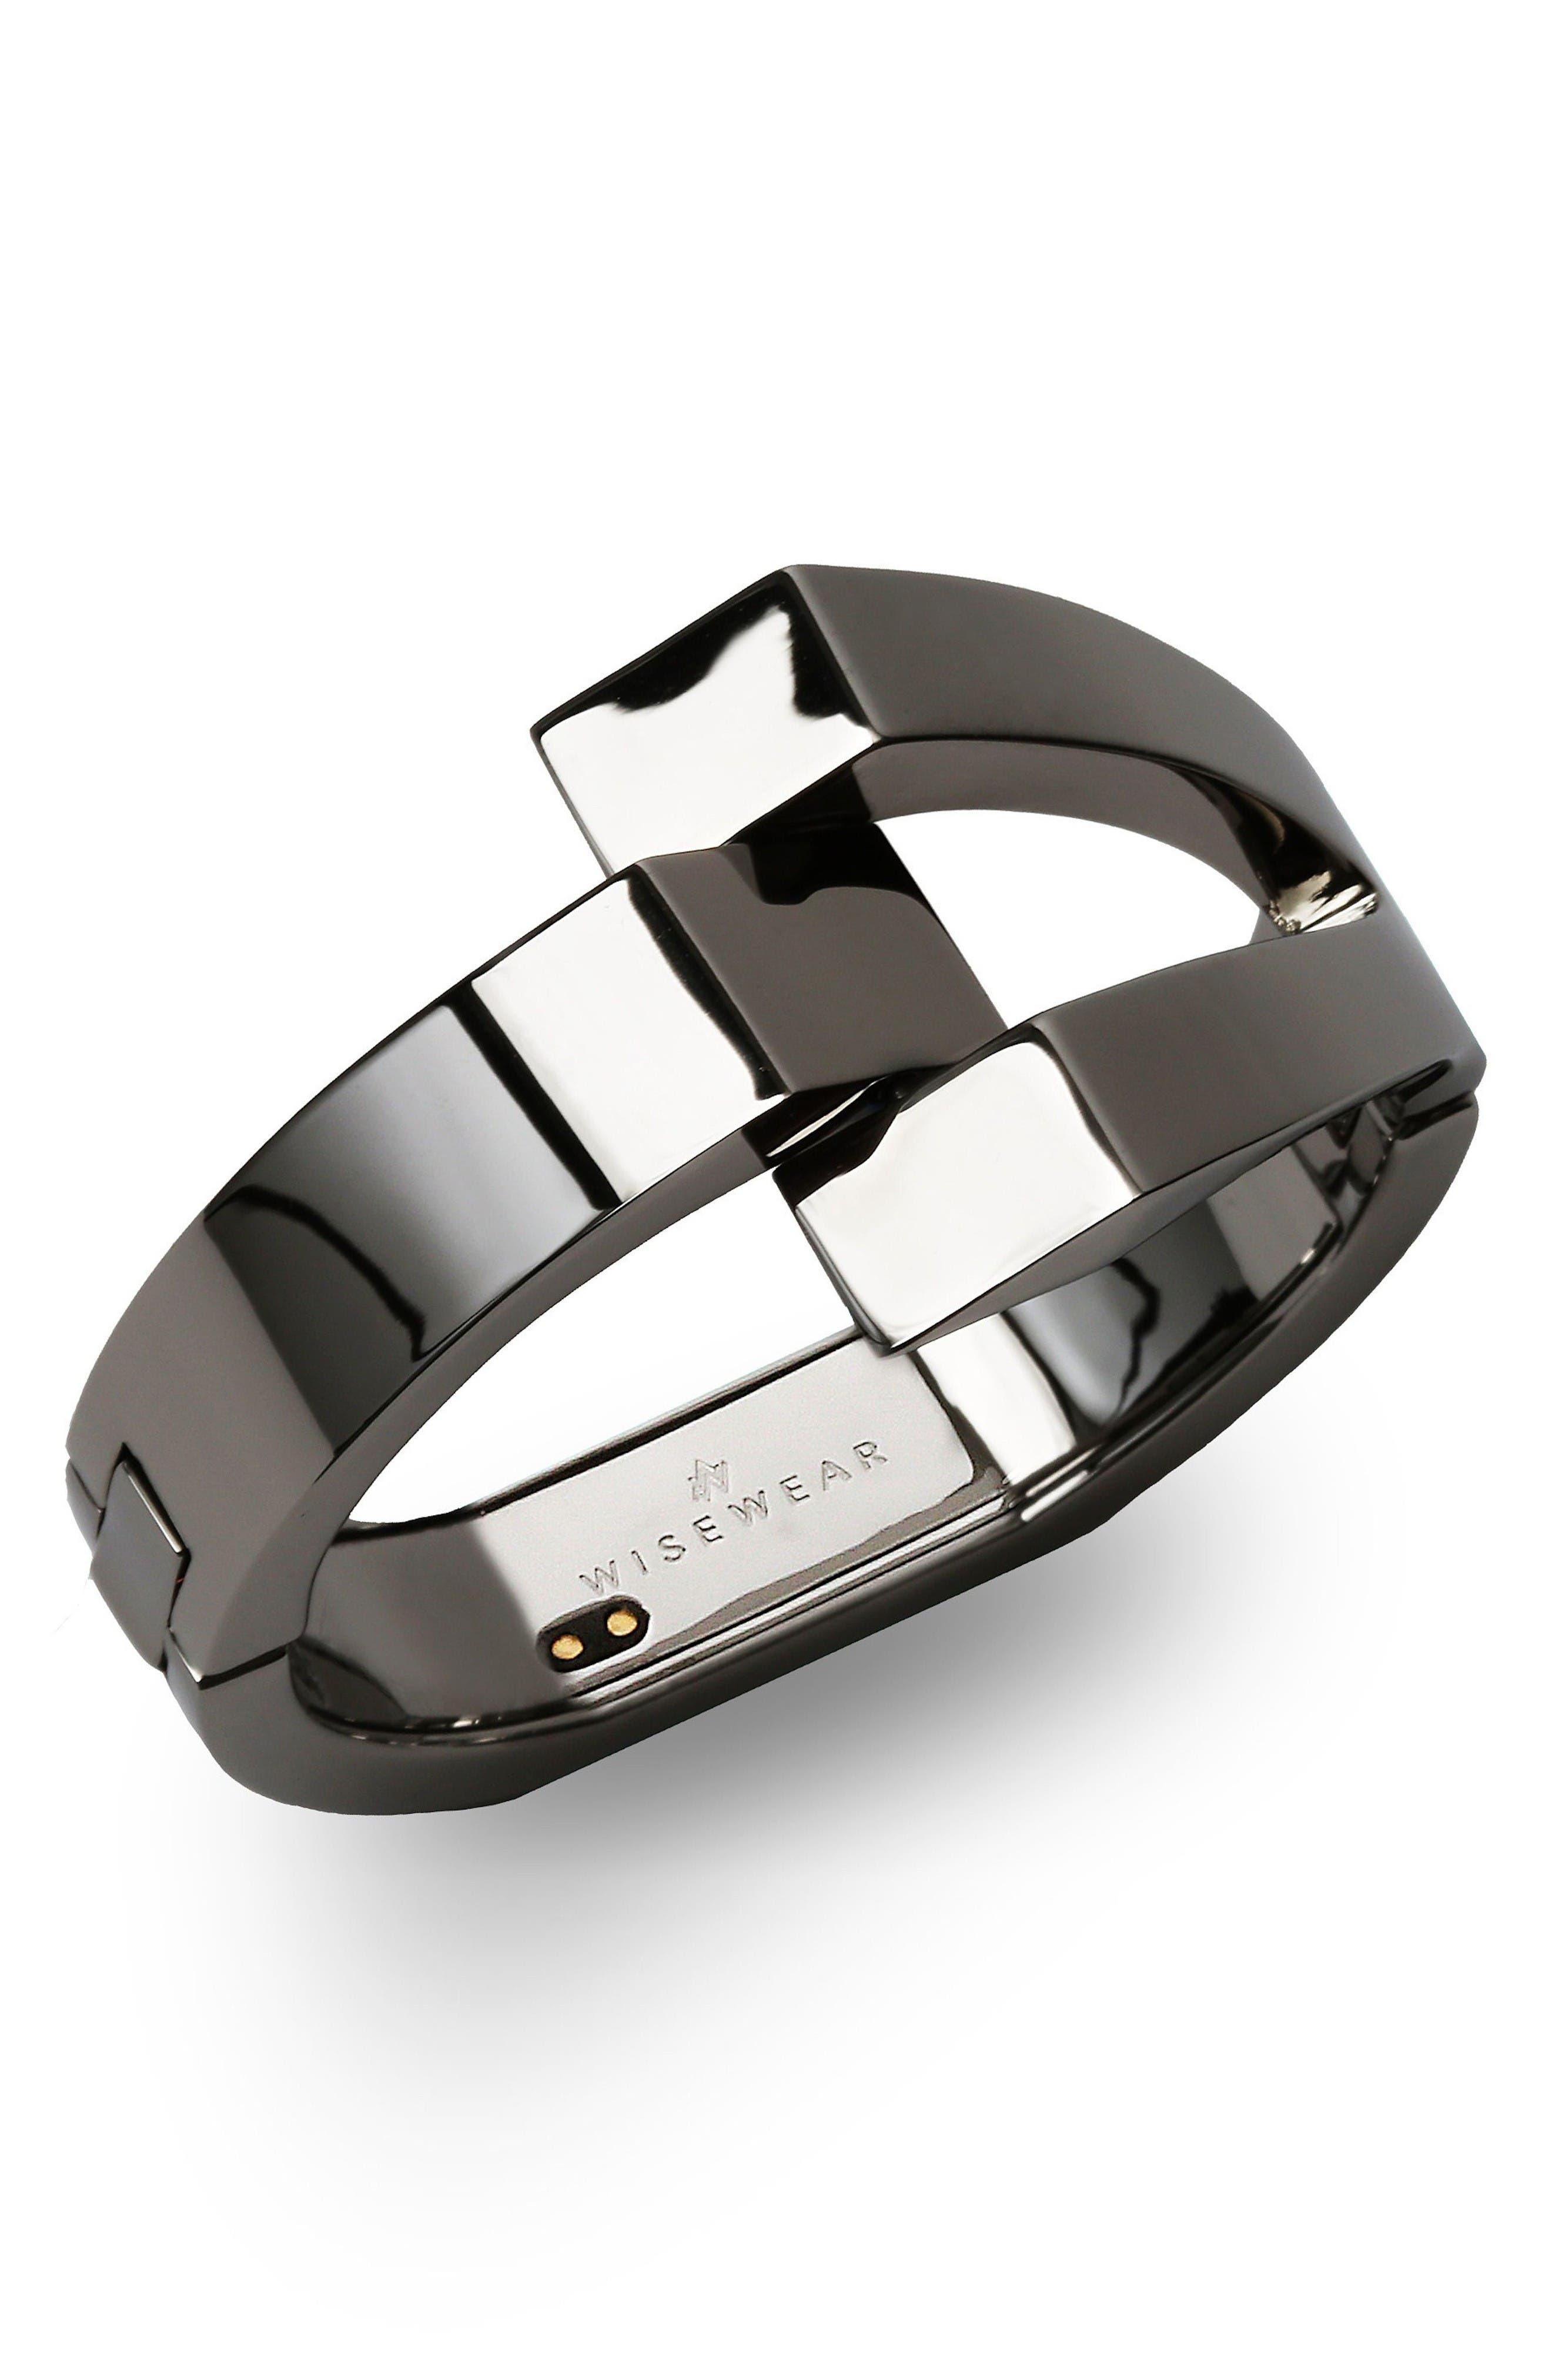 Alternate Image 1 Selected - WiseWear Calder Activity Tracker Bangle